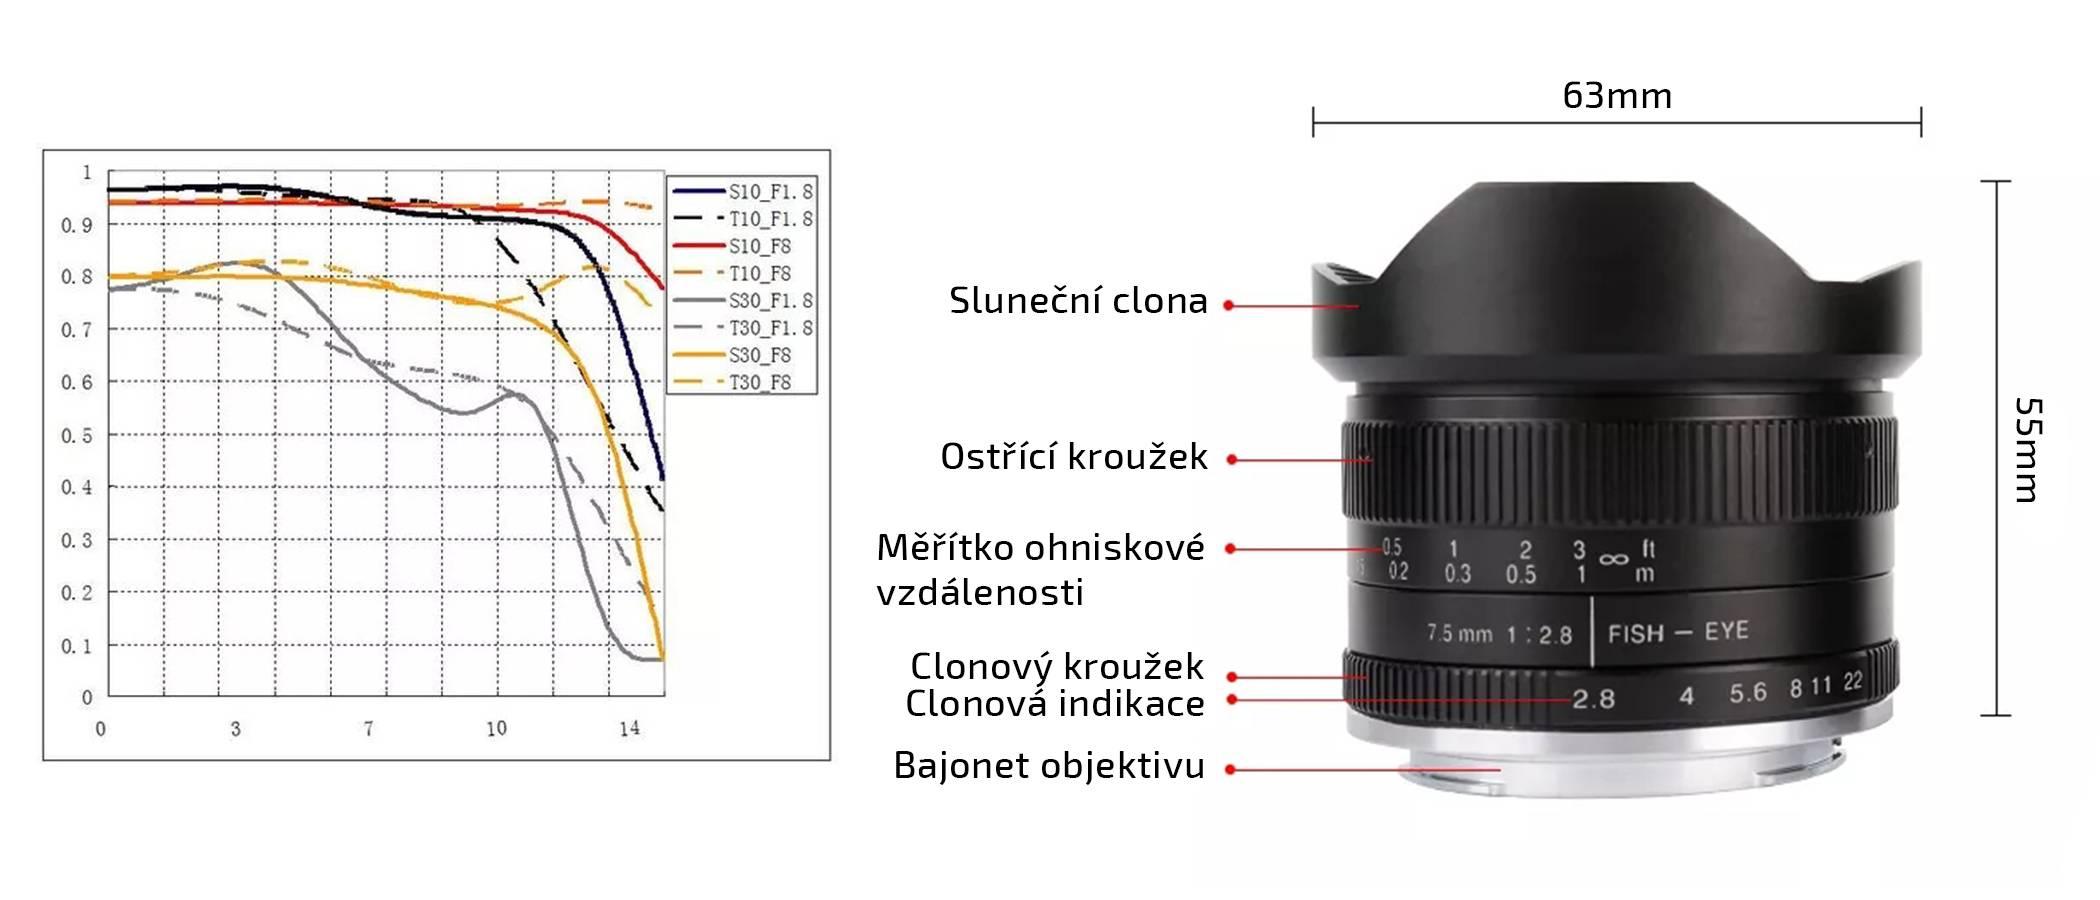 film-technika-7artisans-7-5-mm-aps-c-objektiv-popis